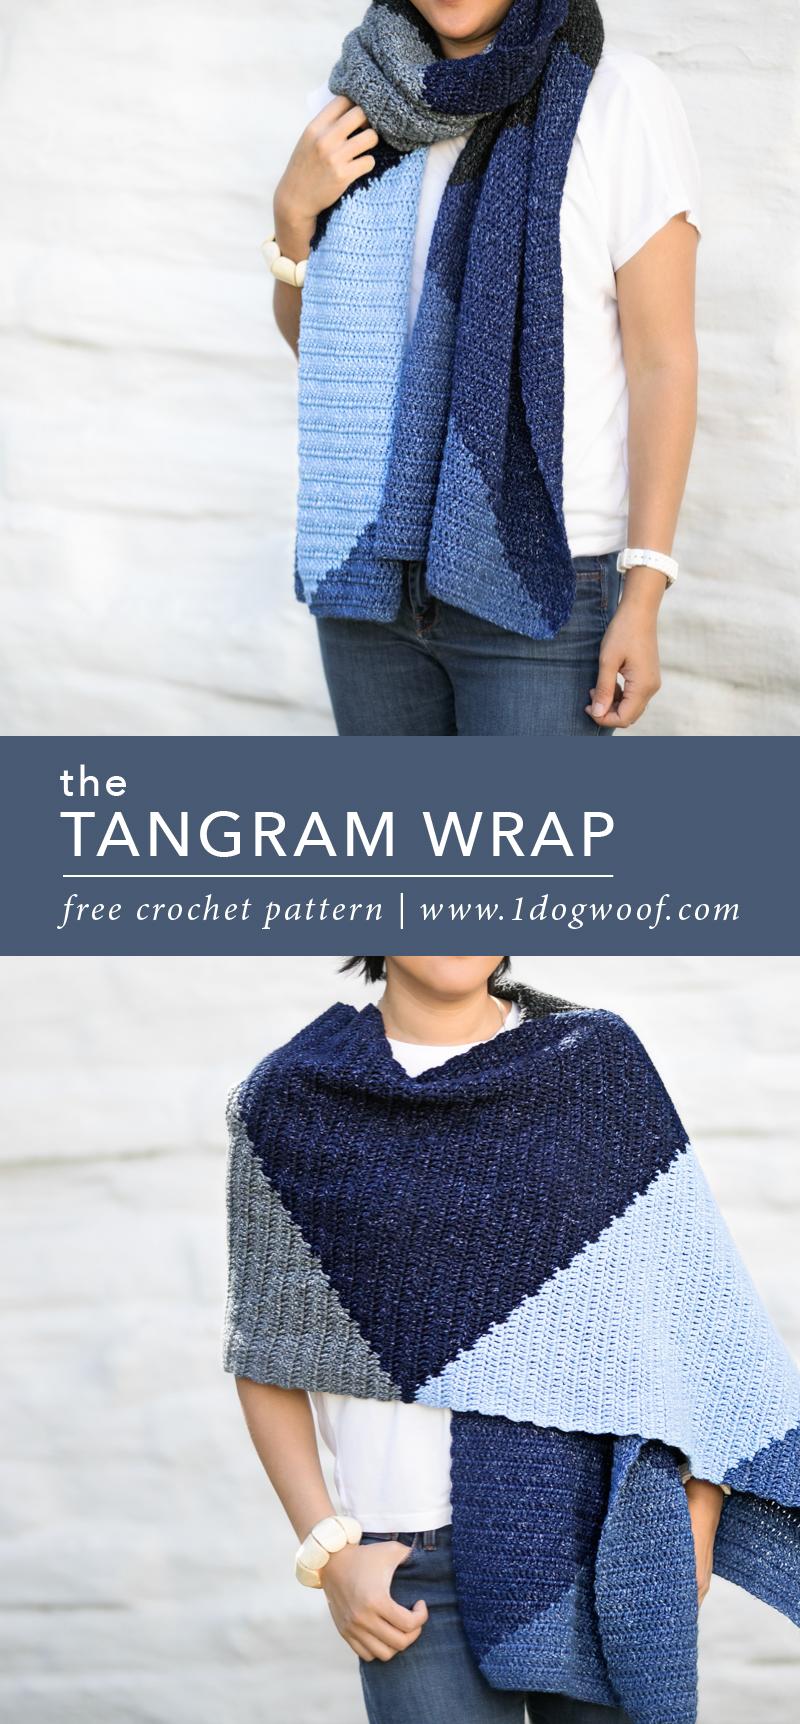 The Tangram Wrap A Modern Crochet Scarf Wrap One Dog Woof